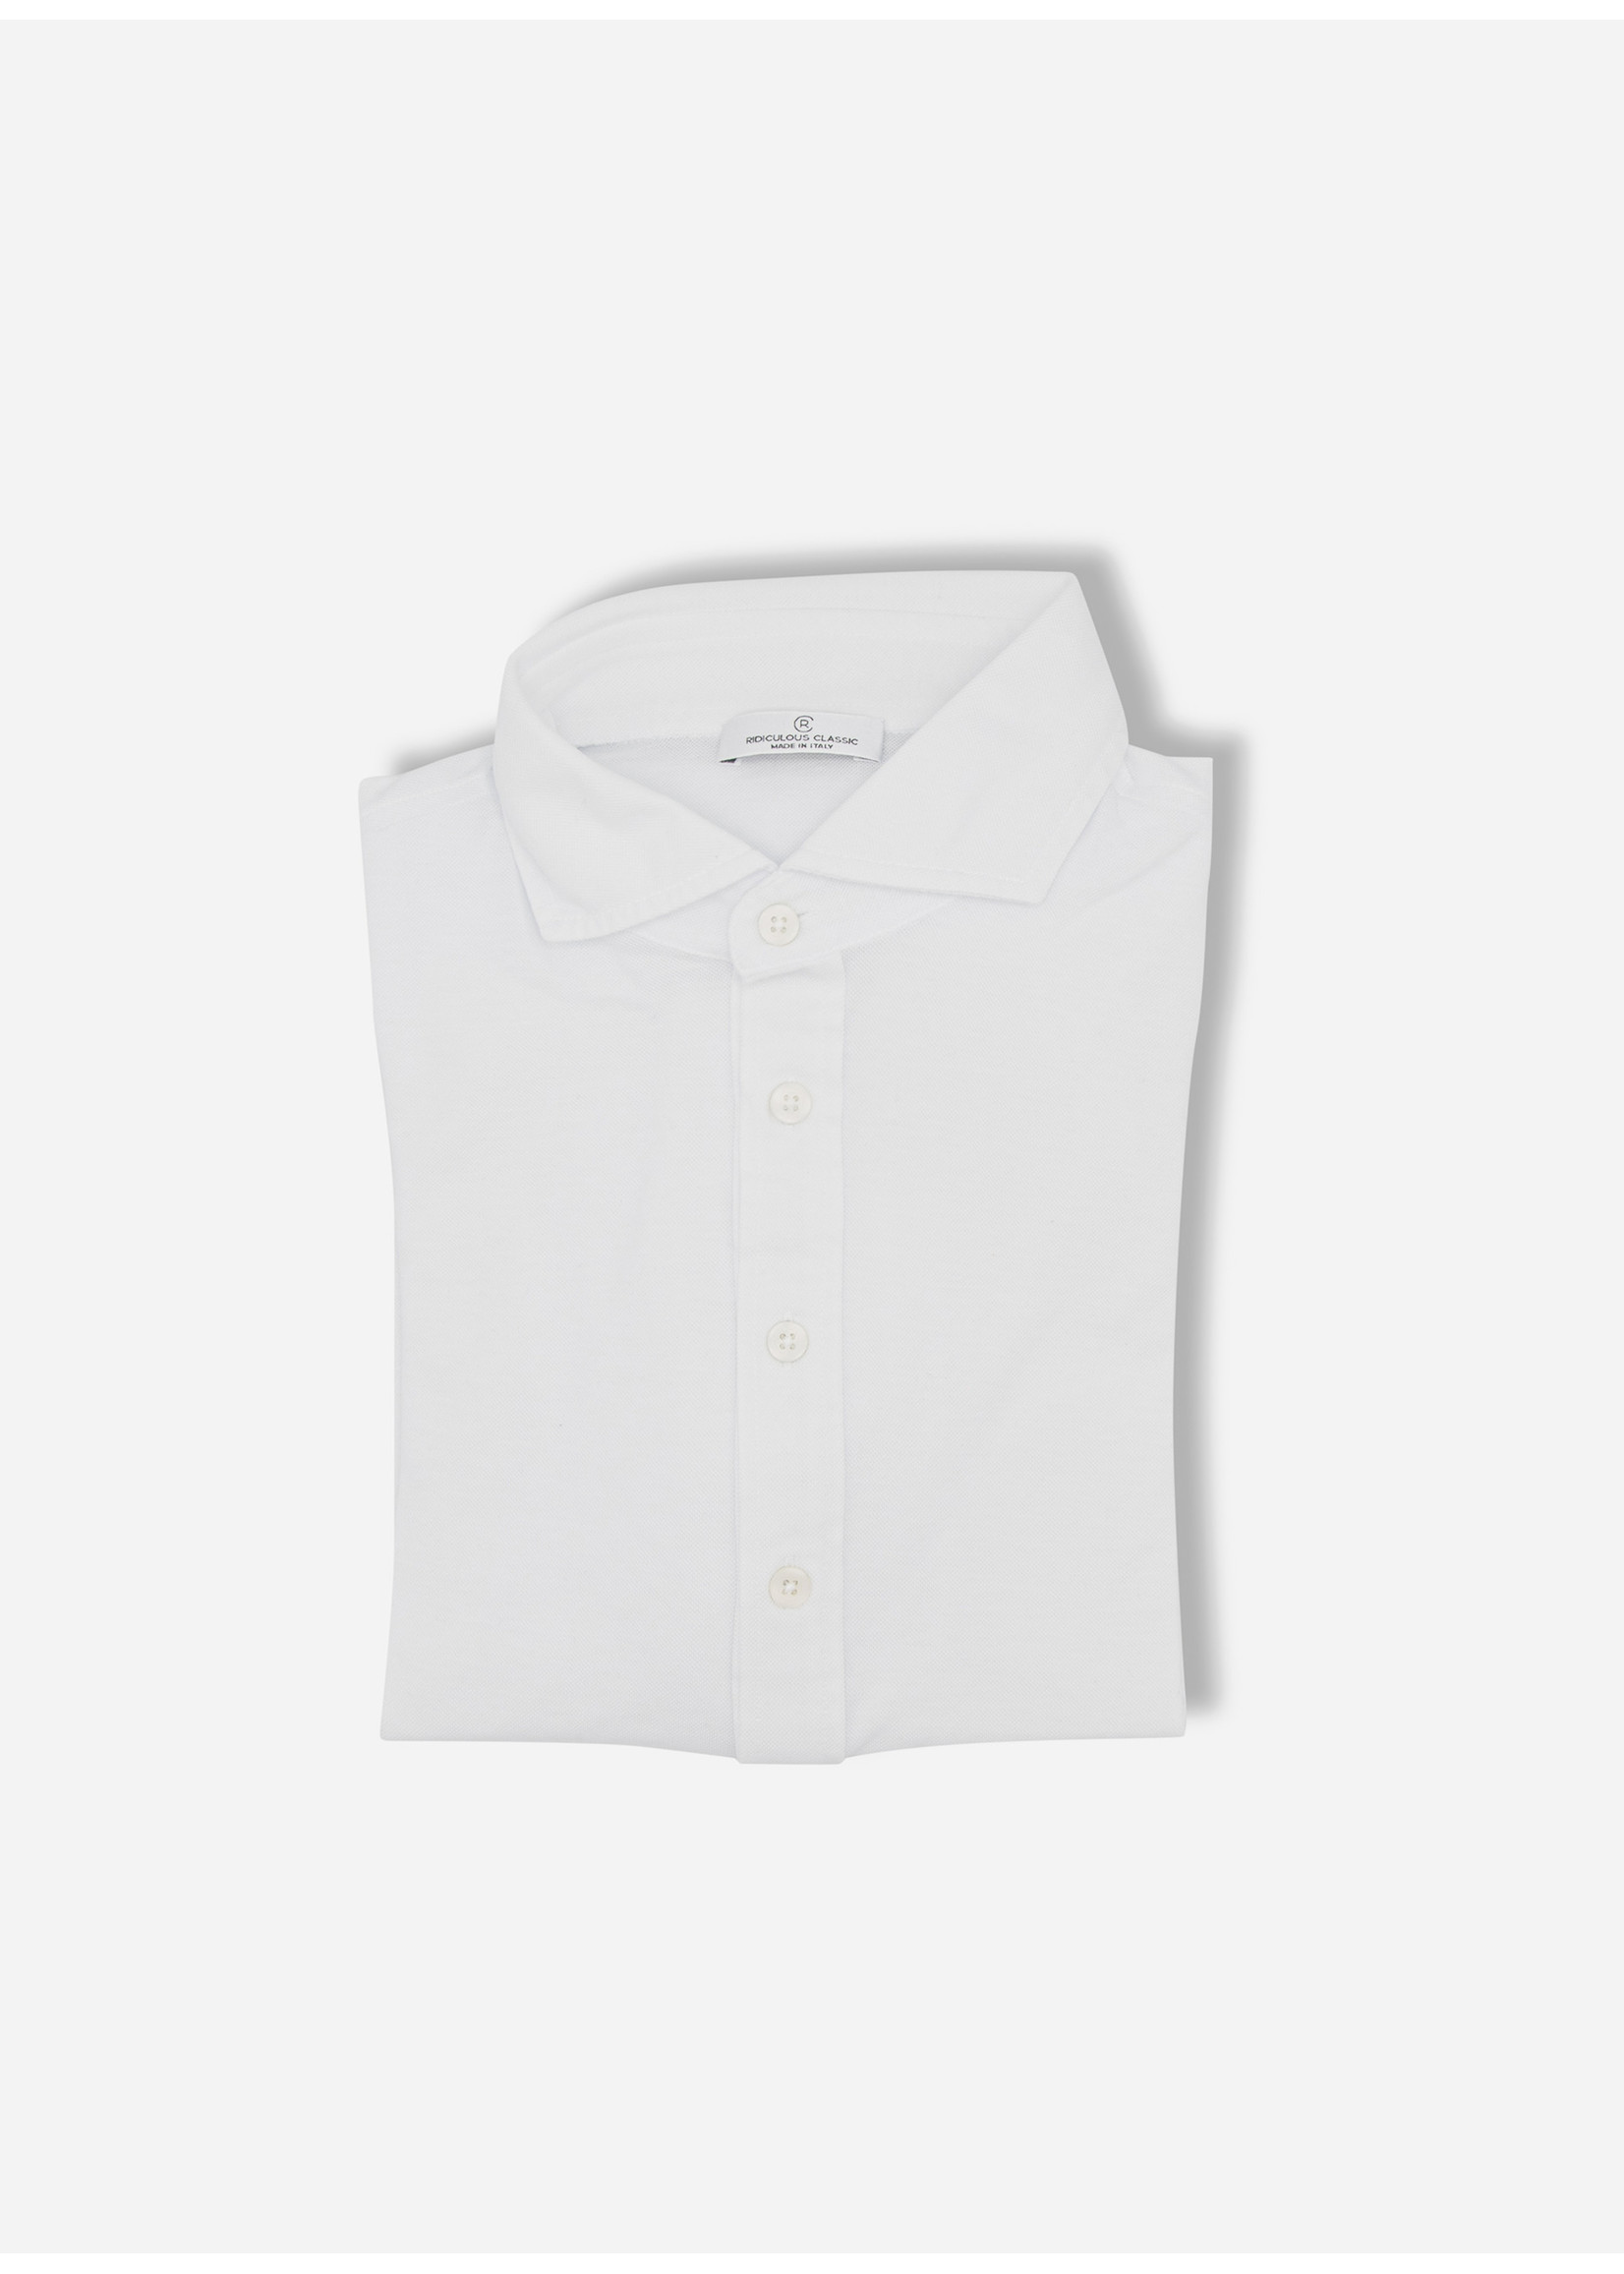 Ridiculous Classic Polo ls shirt white